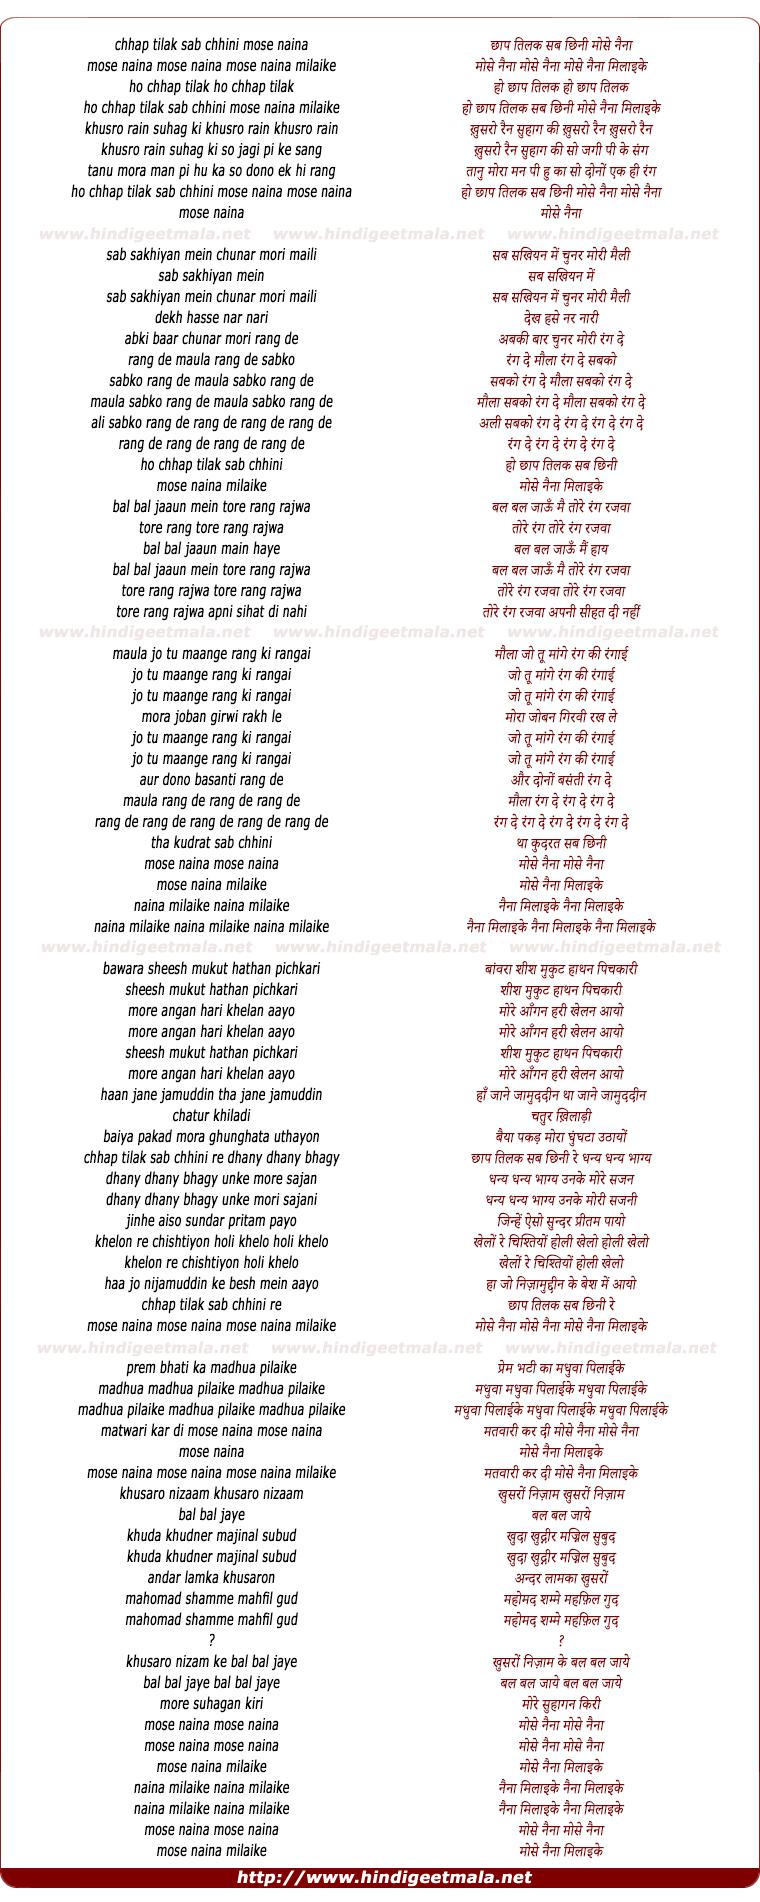 lyrics of song Chhap Tilak Sab Chheeni